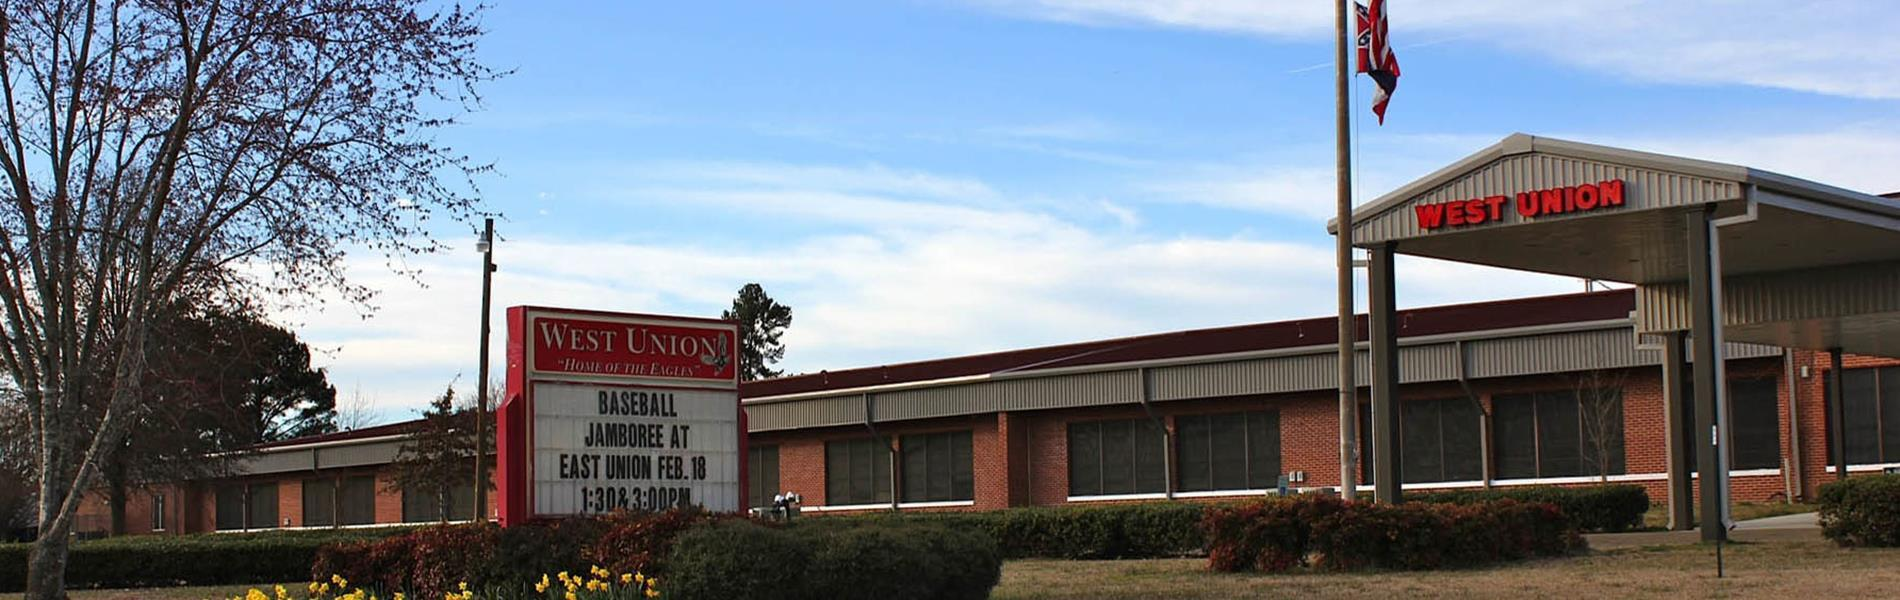 West Union School